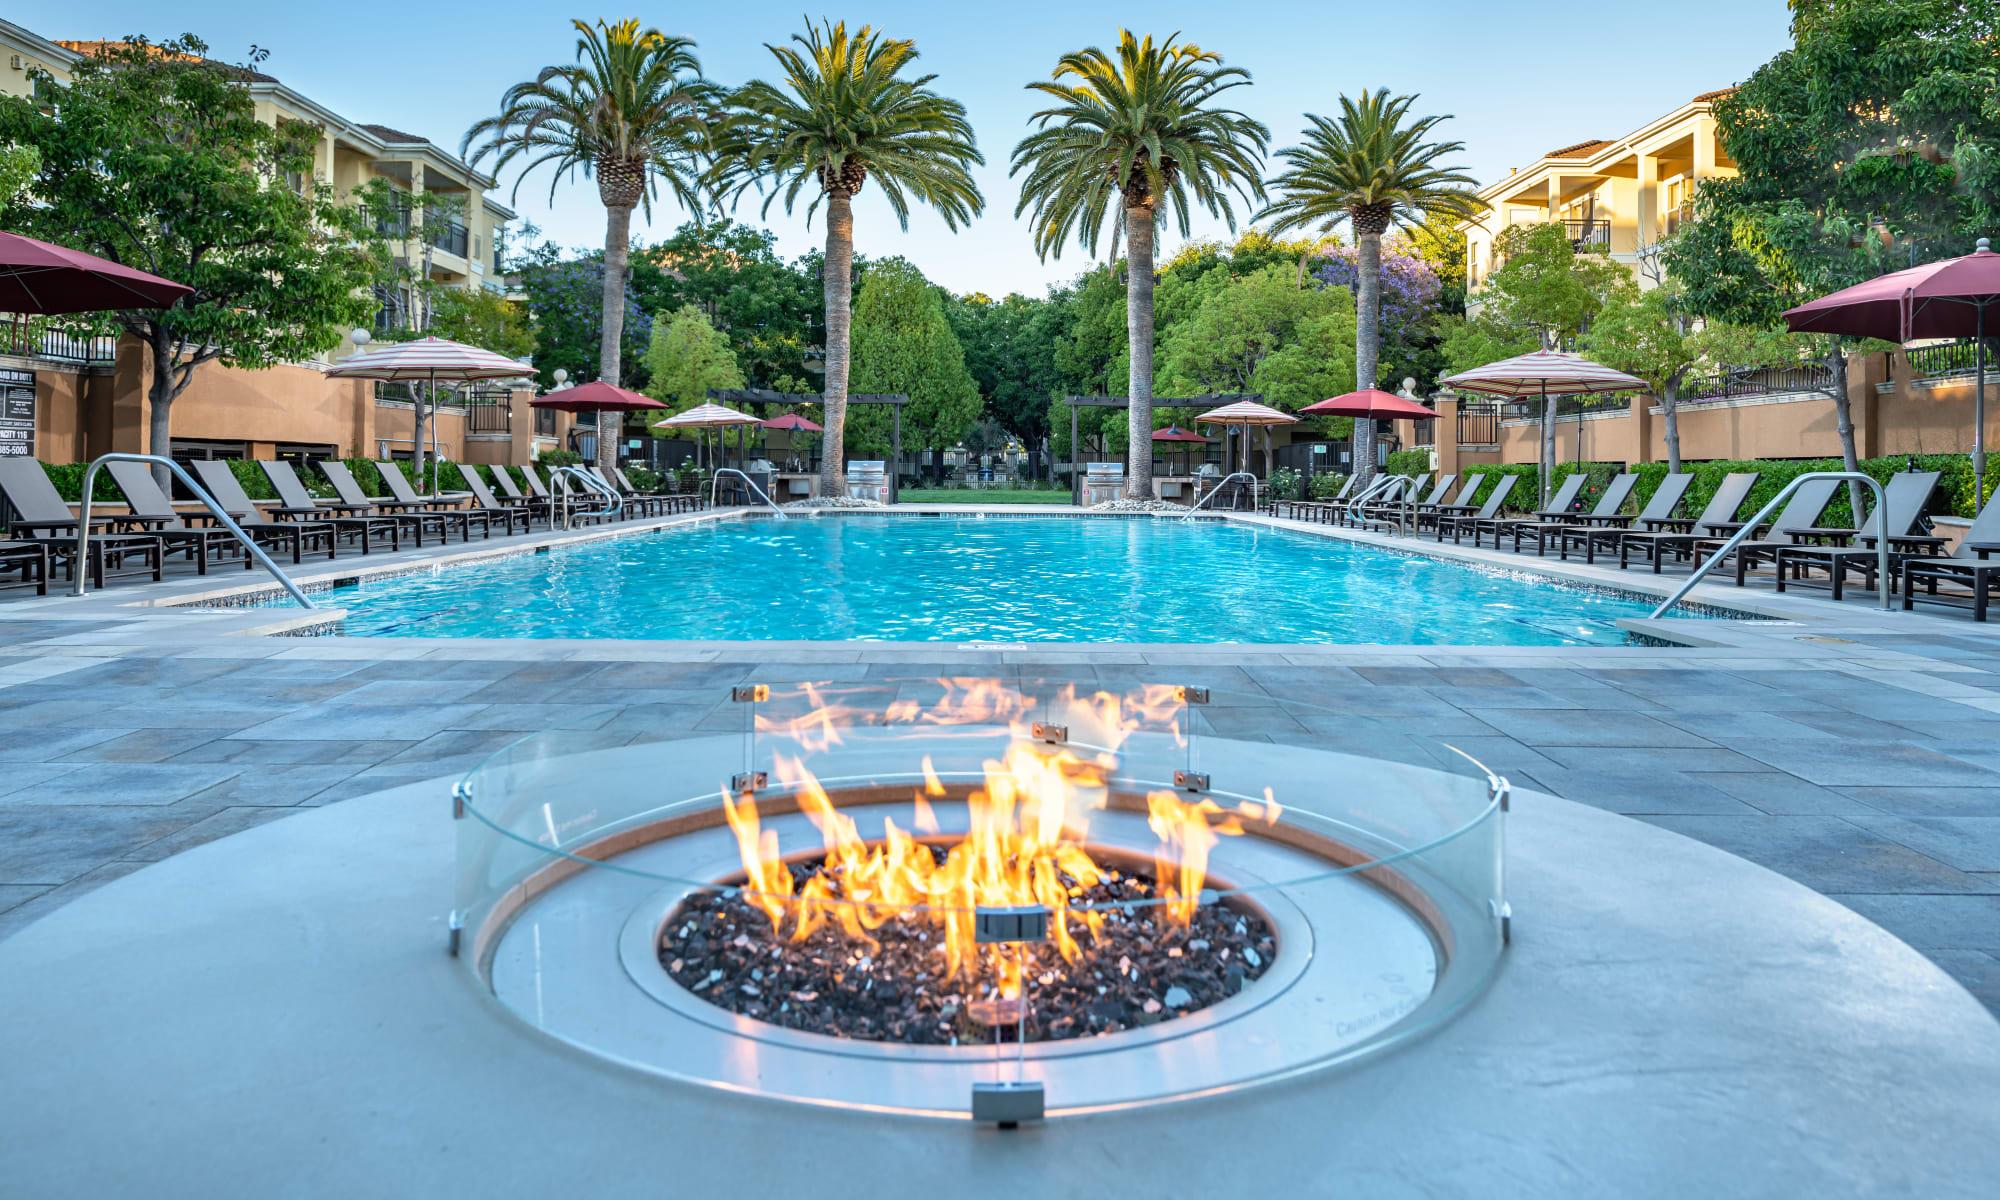 Apartments at The Carlyle in Santa Clara, California